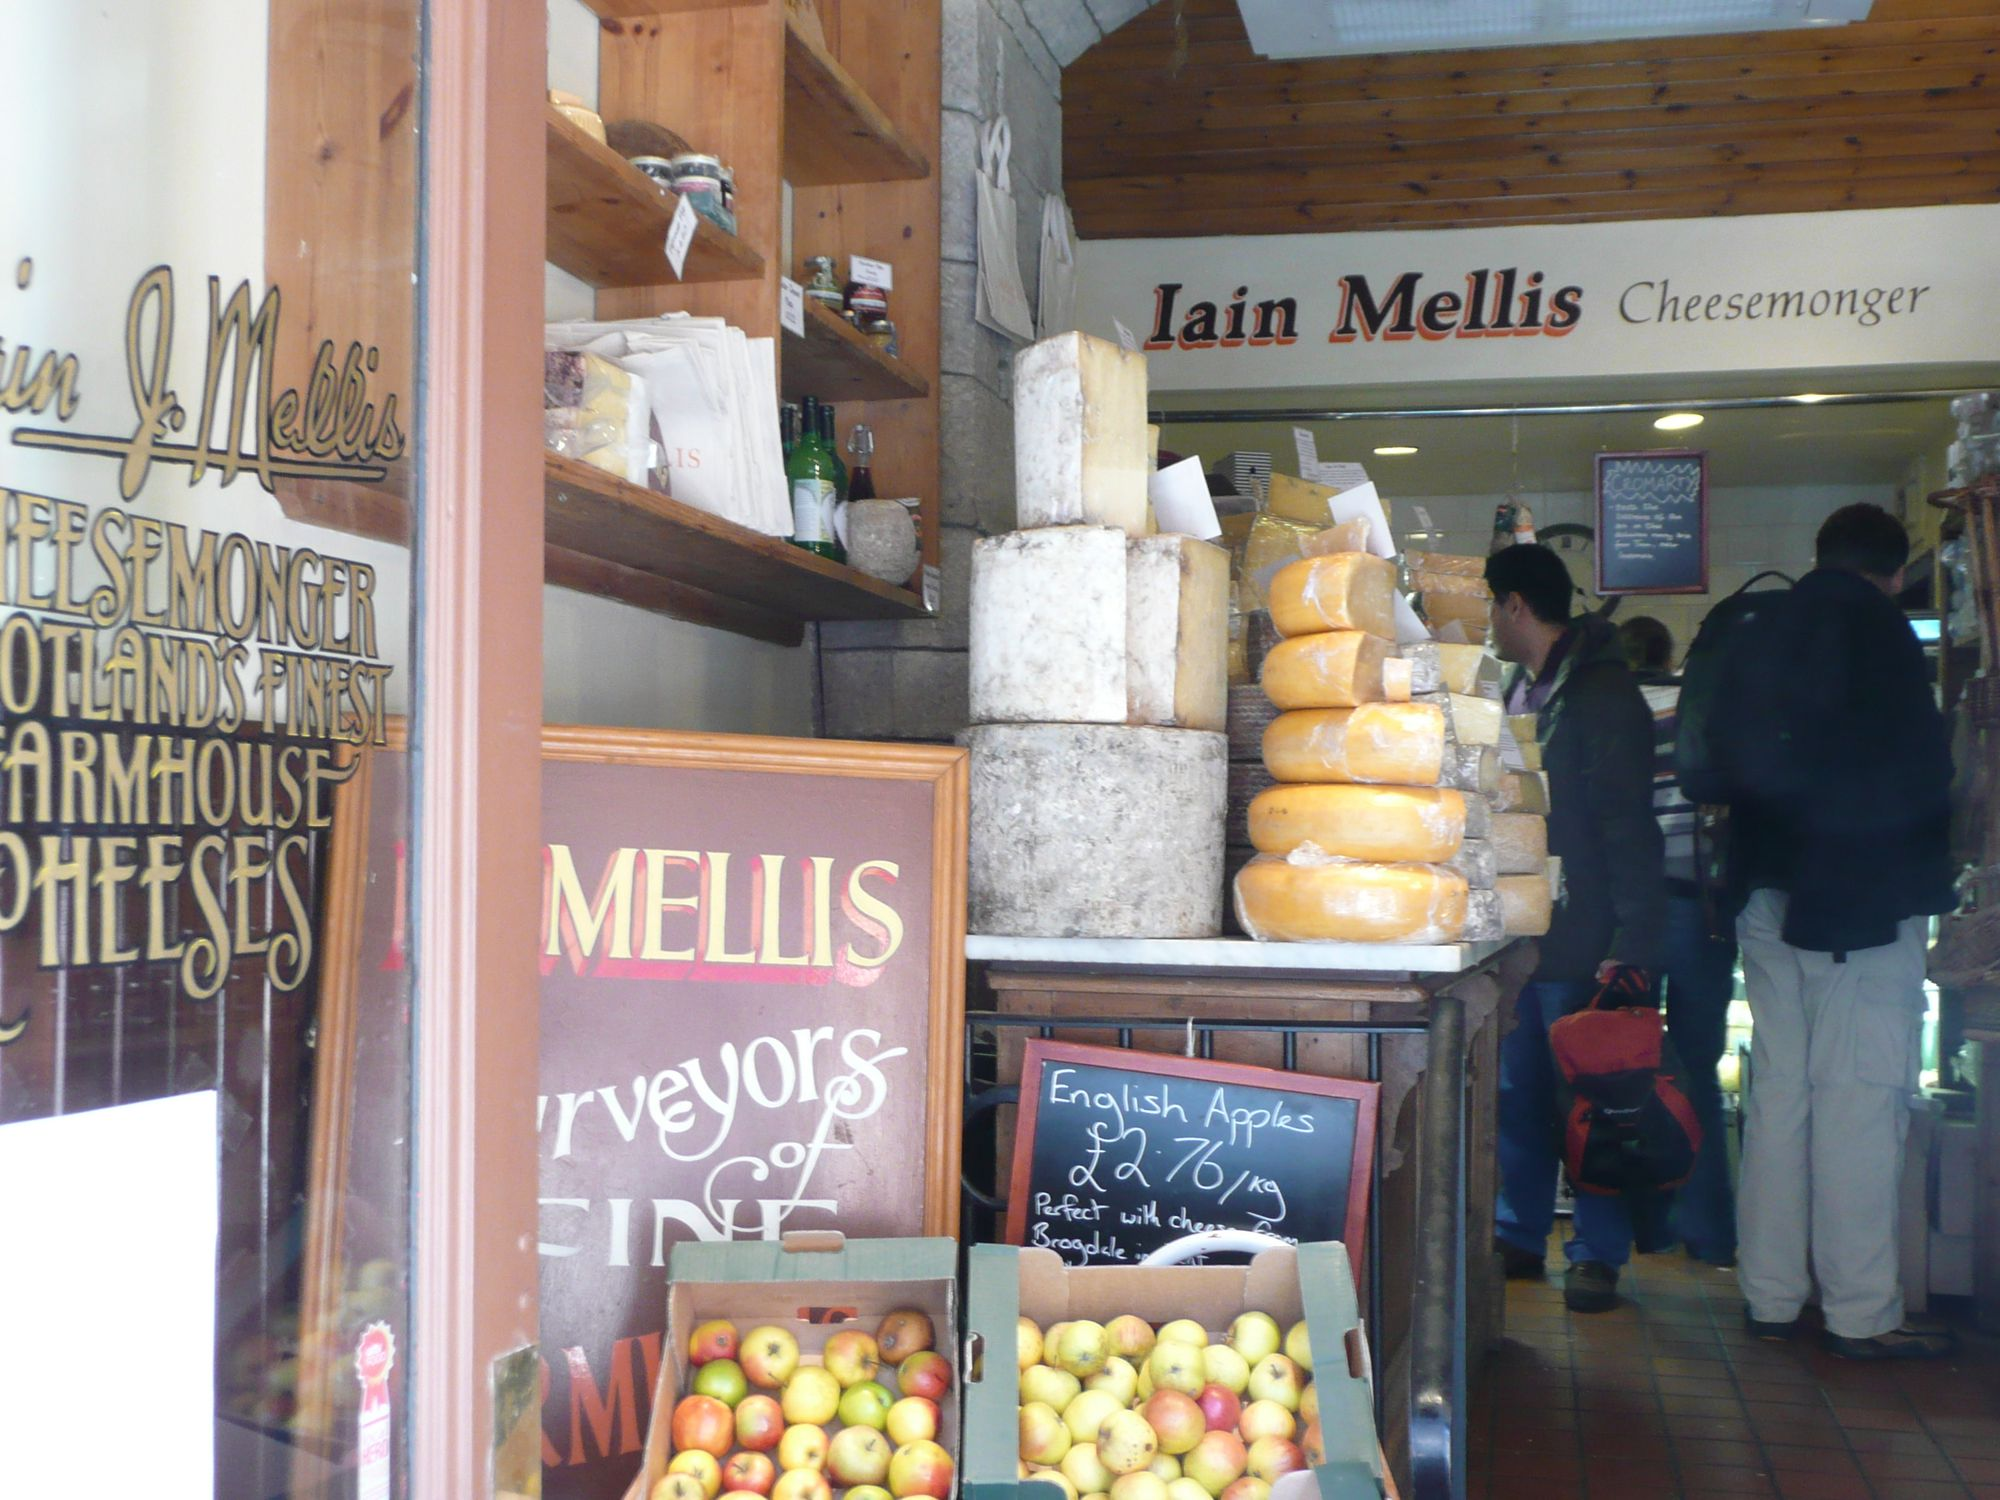 IJ Mellis Cheesemongers